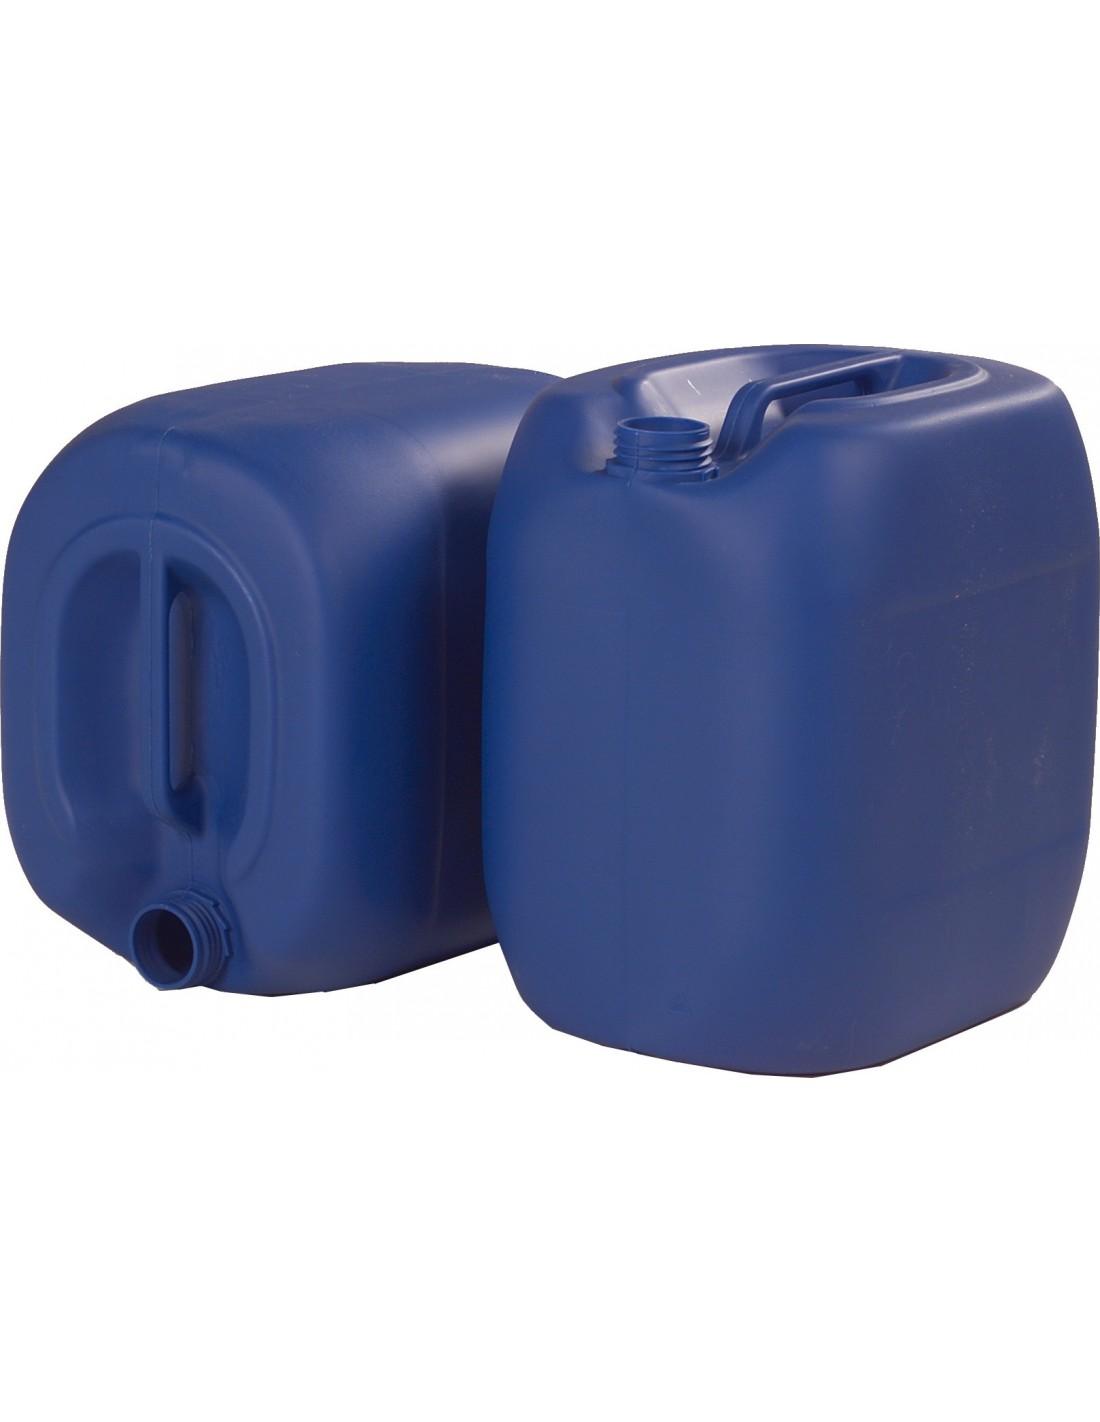 30 Liter Kanister 1300g ohne Verschluss, UN-X